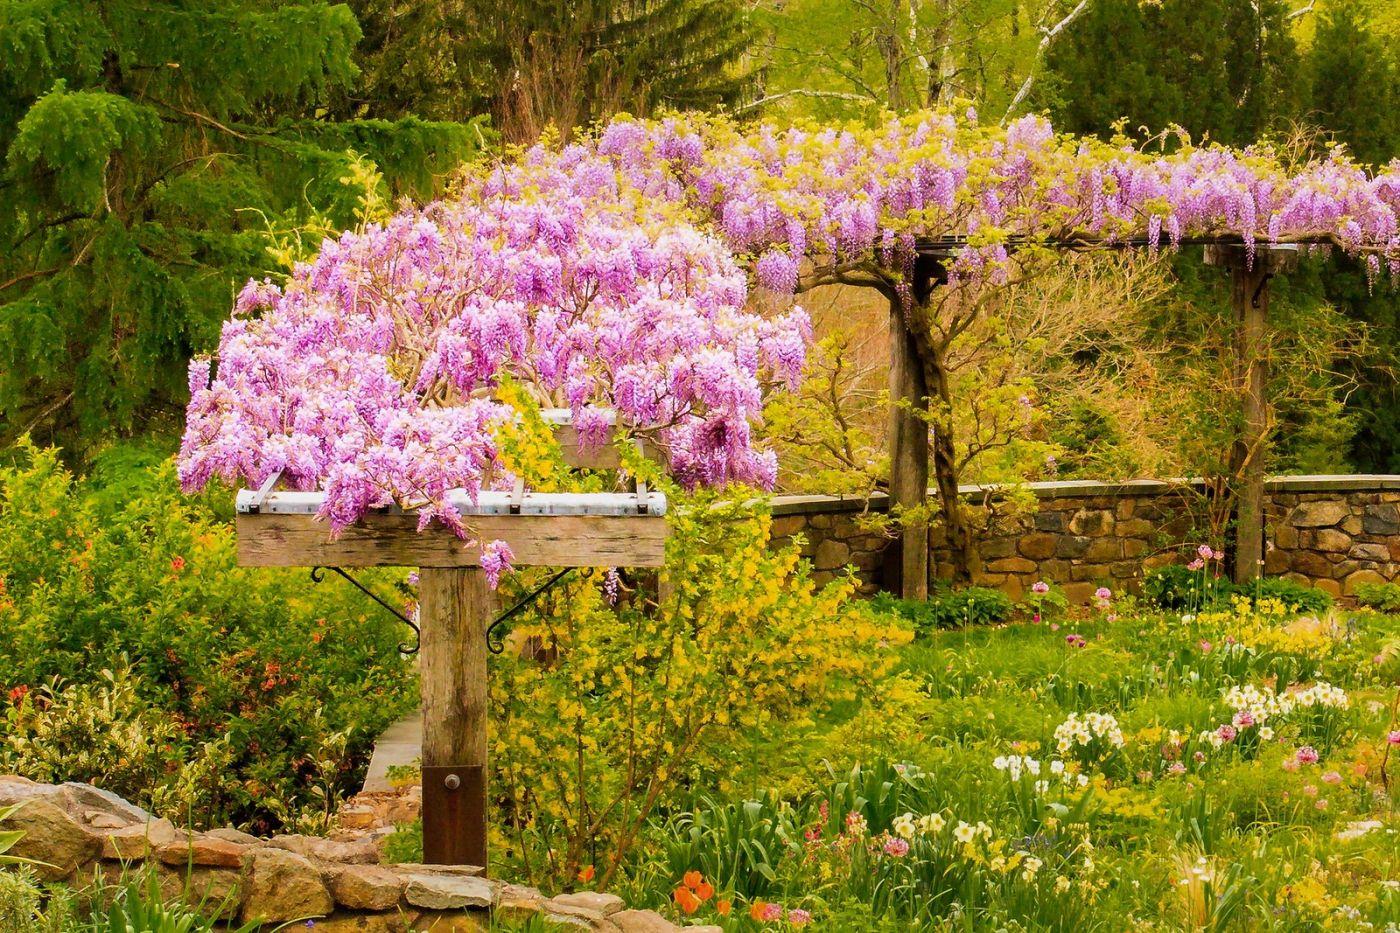 Chanticleer花园,那年盛开的紫藤花_图1-19